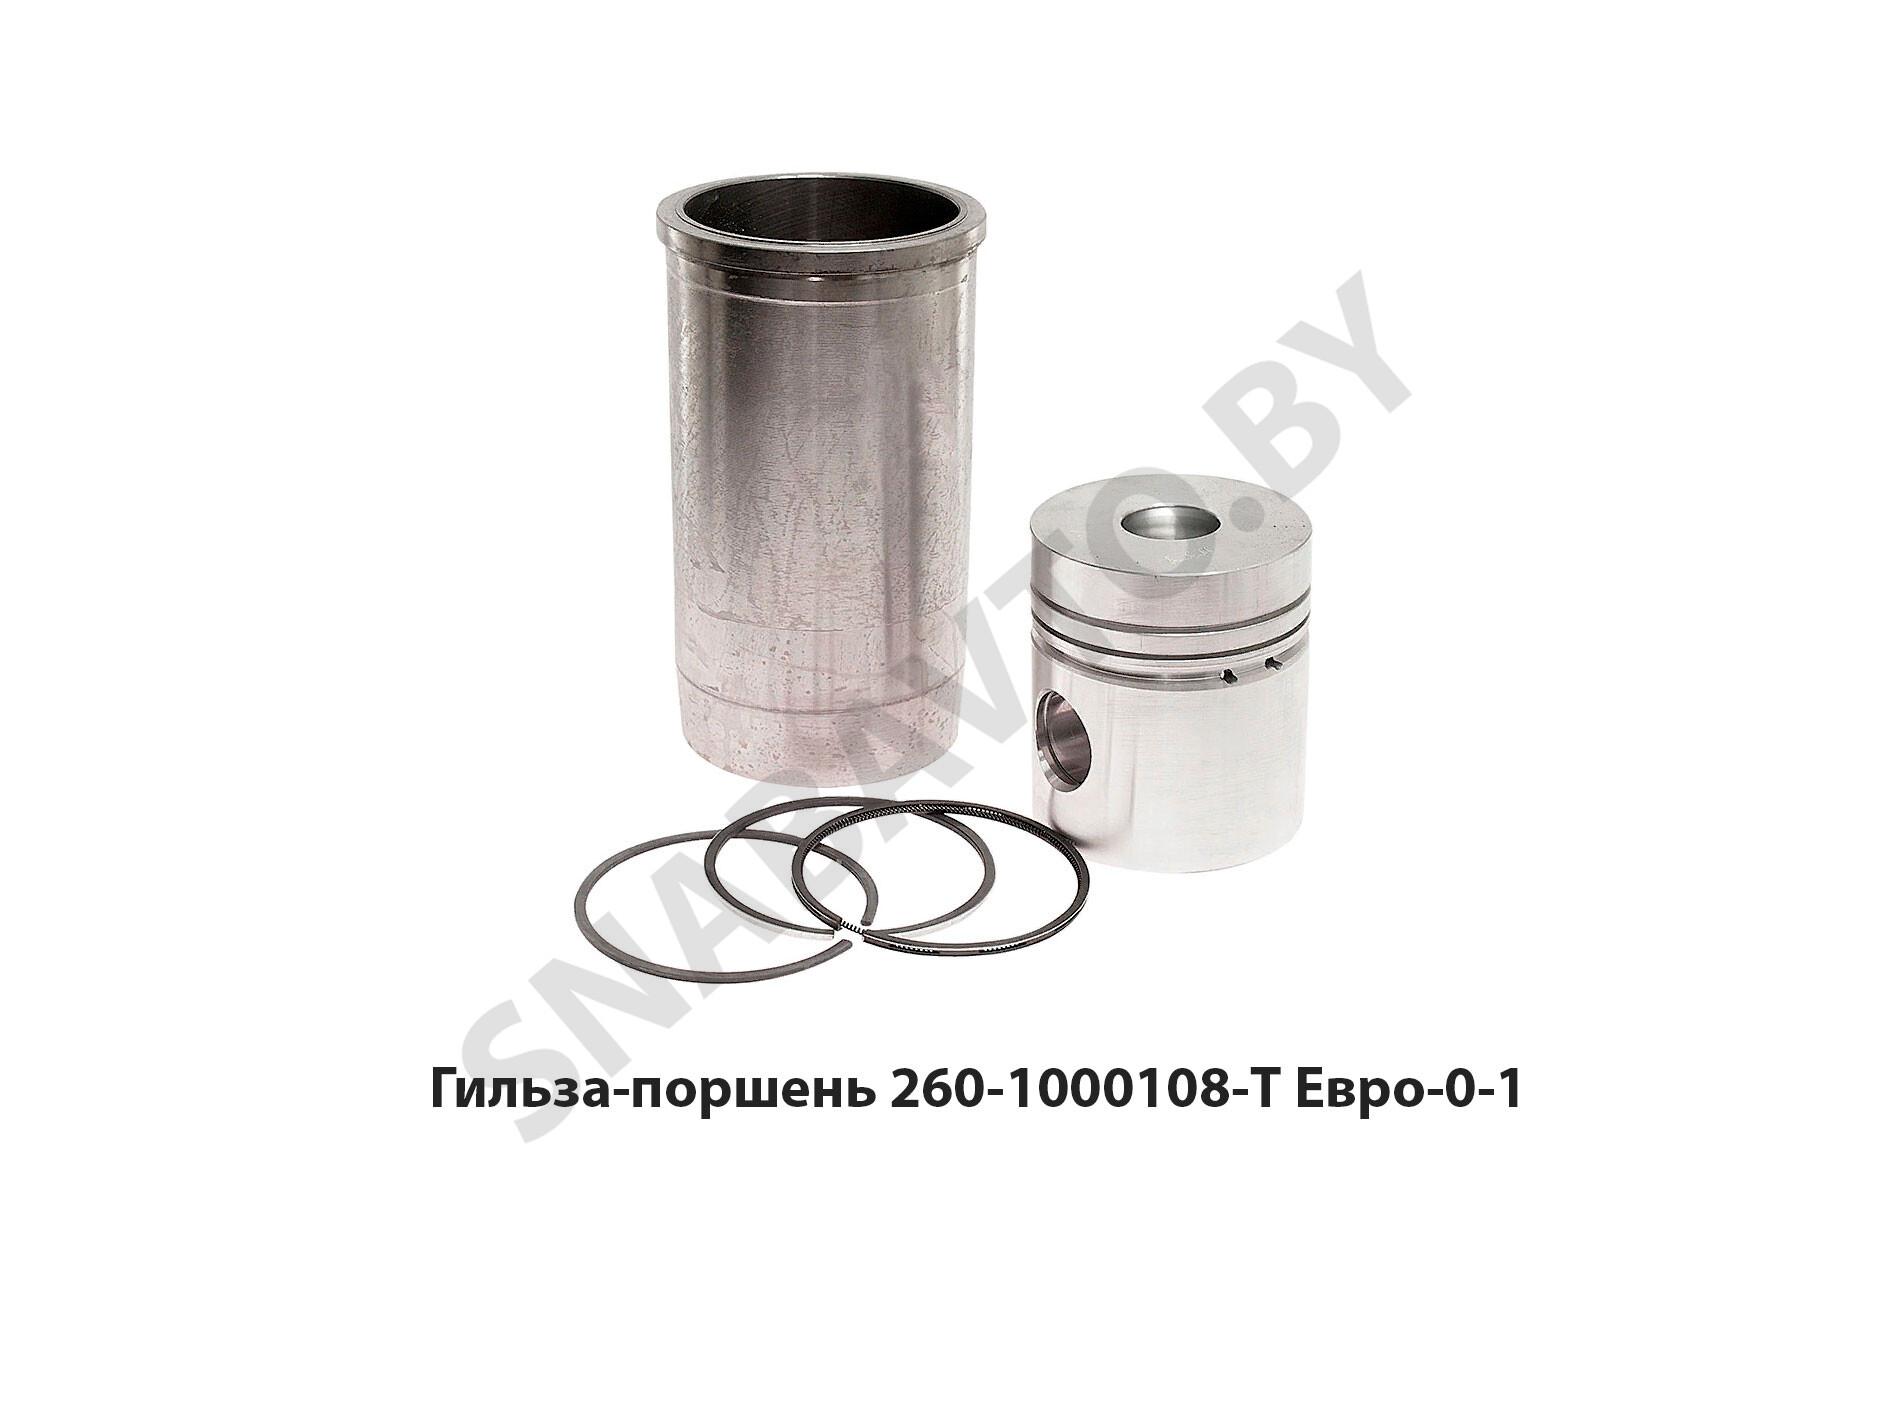 260-1000108-Т Евро-0-1